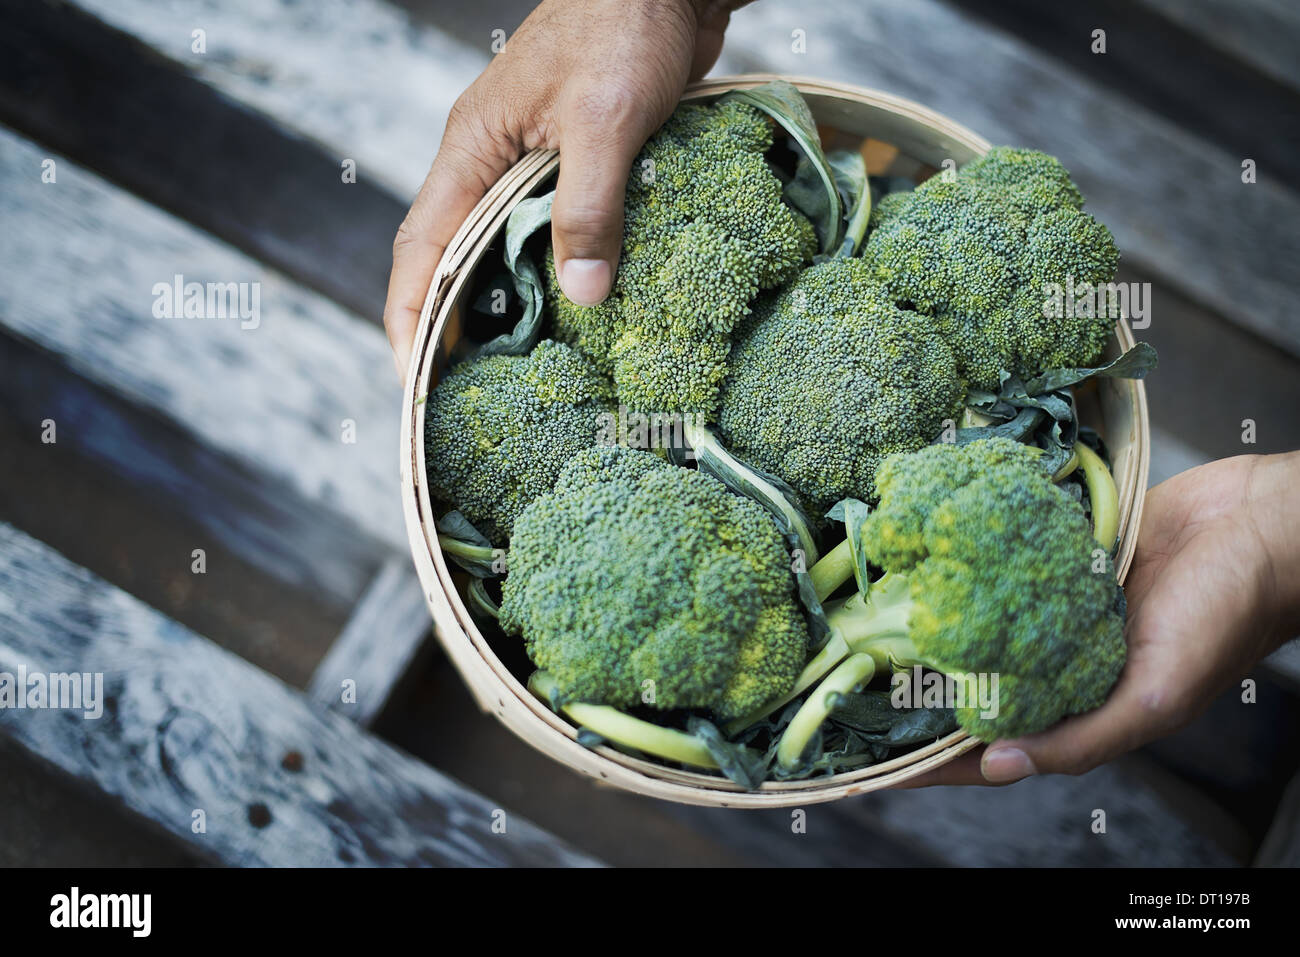 Woodstock New York USA Organic Broccoli just harvested - Stock Image